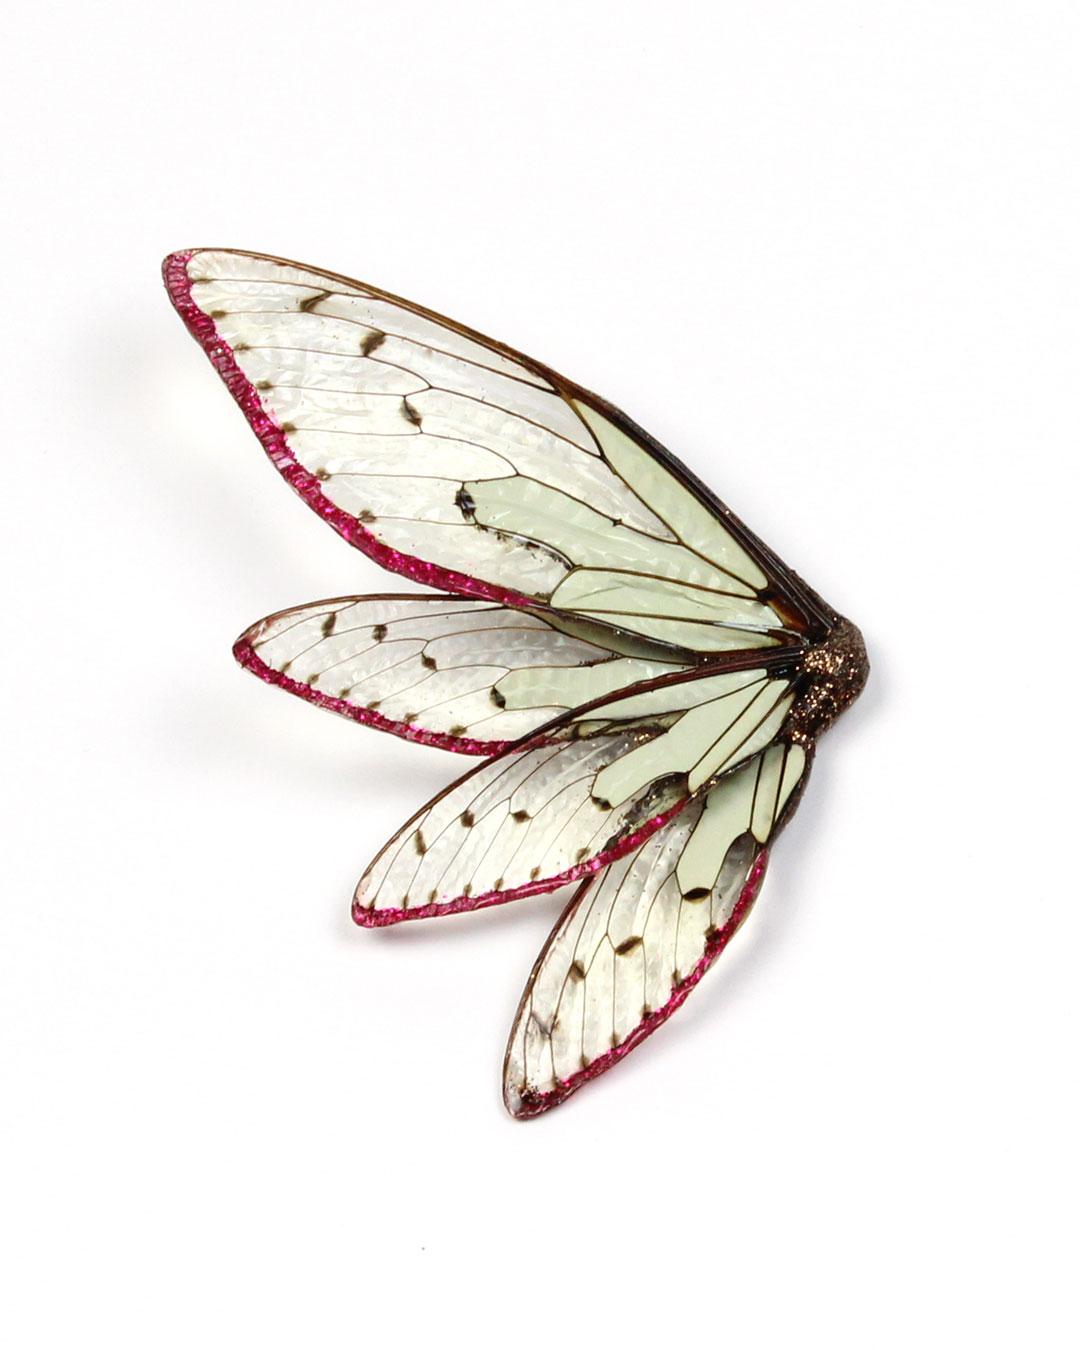 Märta Mattsson, Wings, 2016, broche; cicaden, lak, hars, pigment, zilver, 130 x 70 x 20 mm, €970